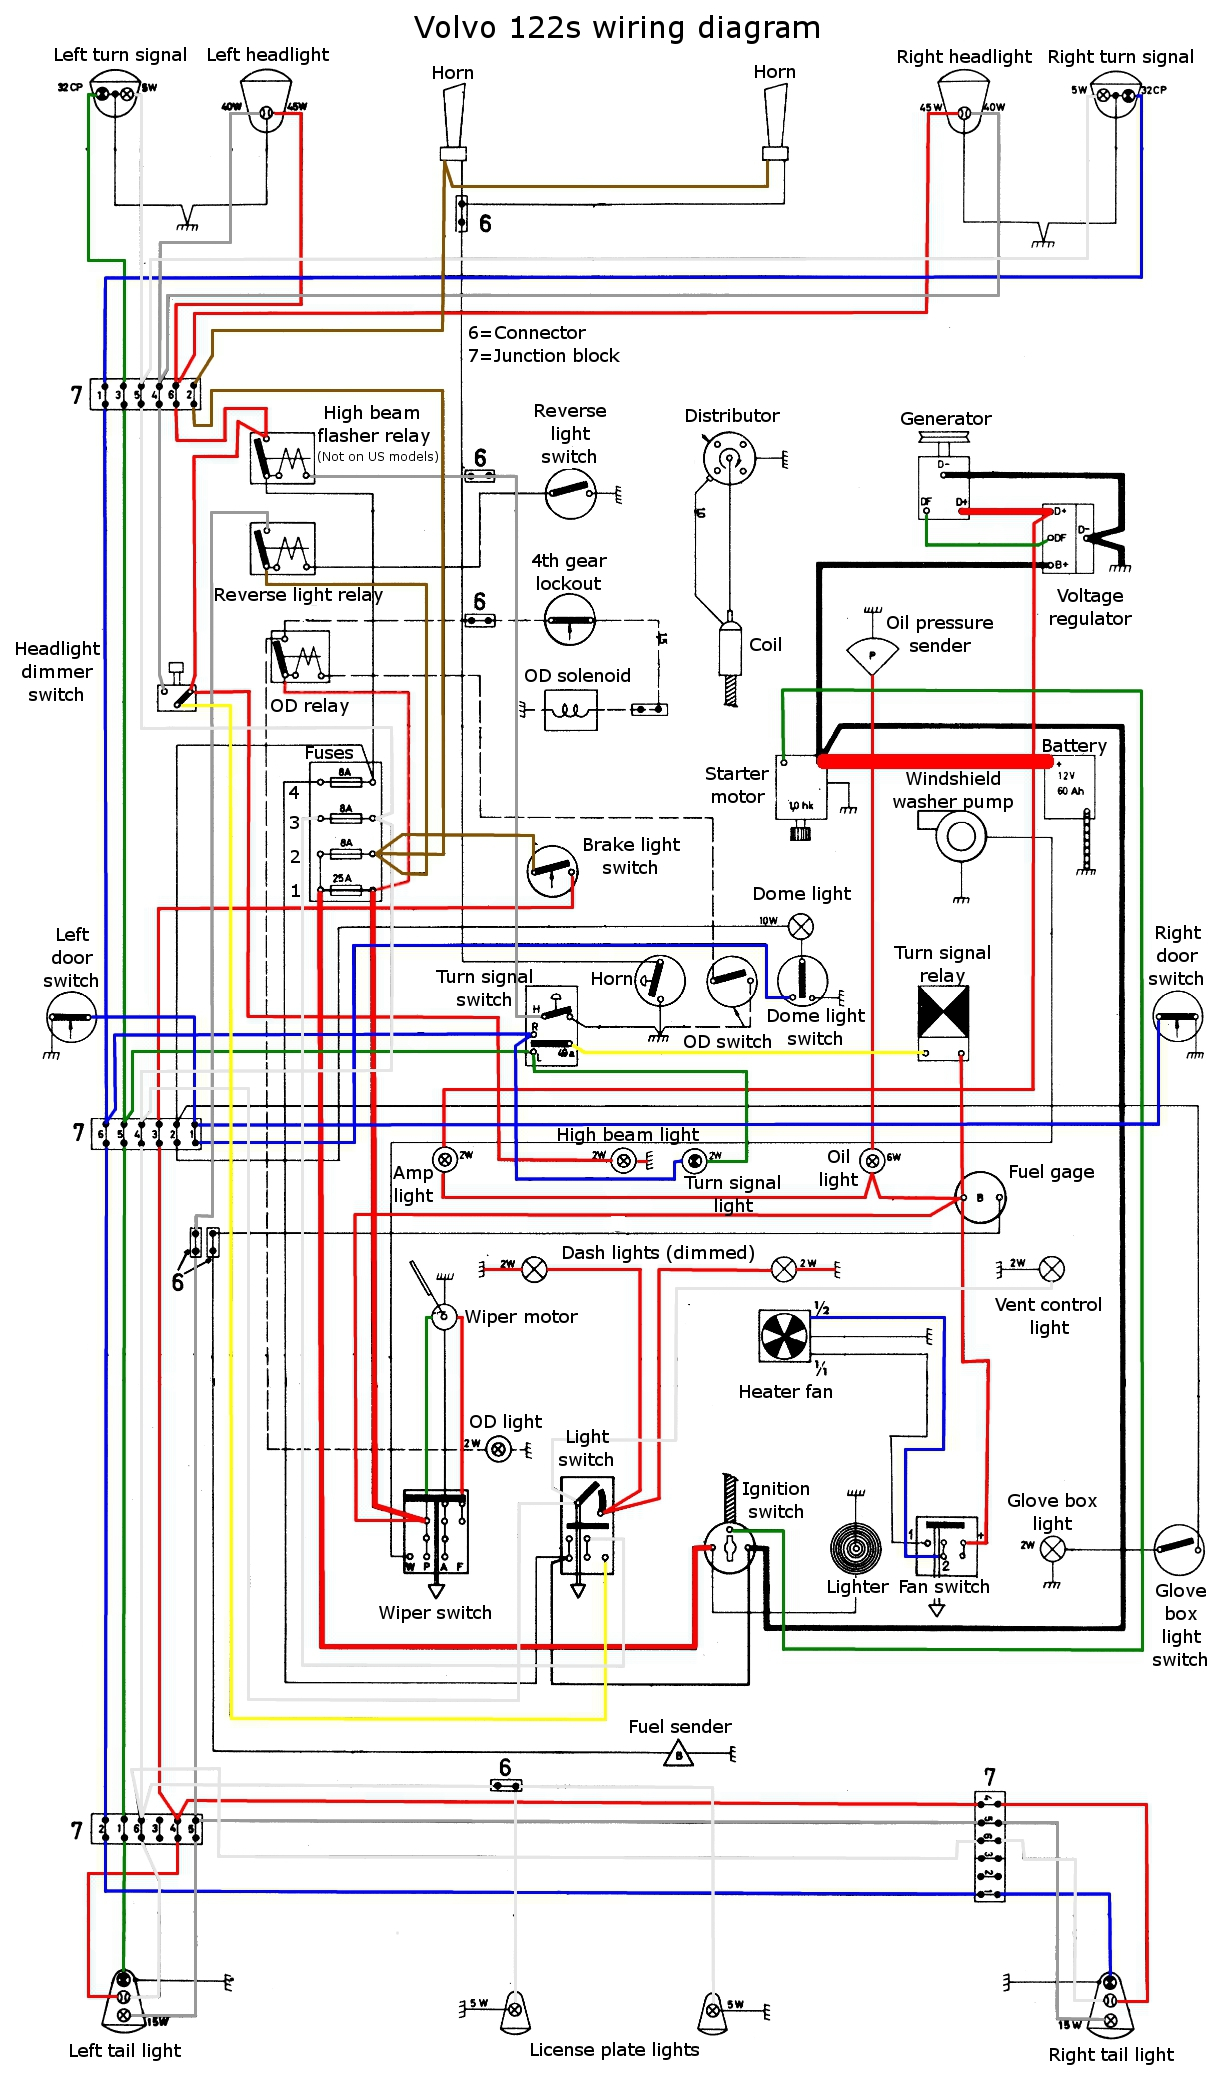 1963 ford radio wiring diagram es 1344  volvo 1800es wiring diagram schematic wiring  volvo 1800es wiring diagram schematic